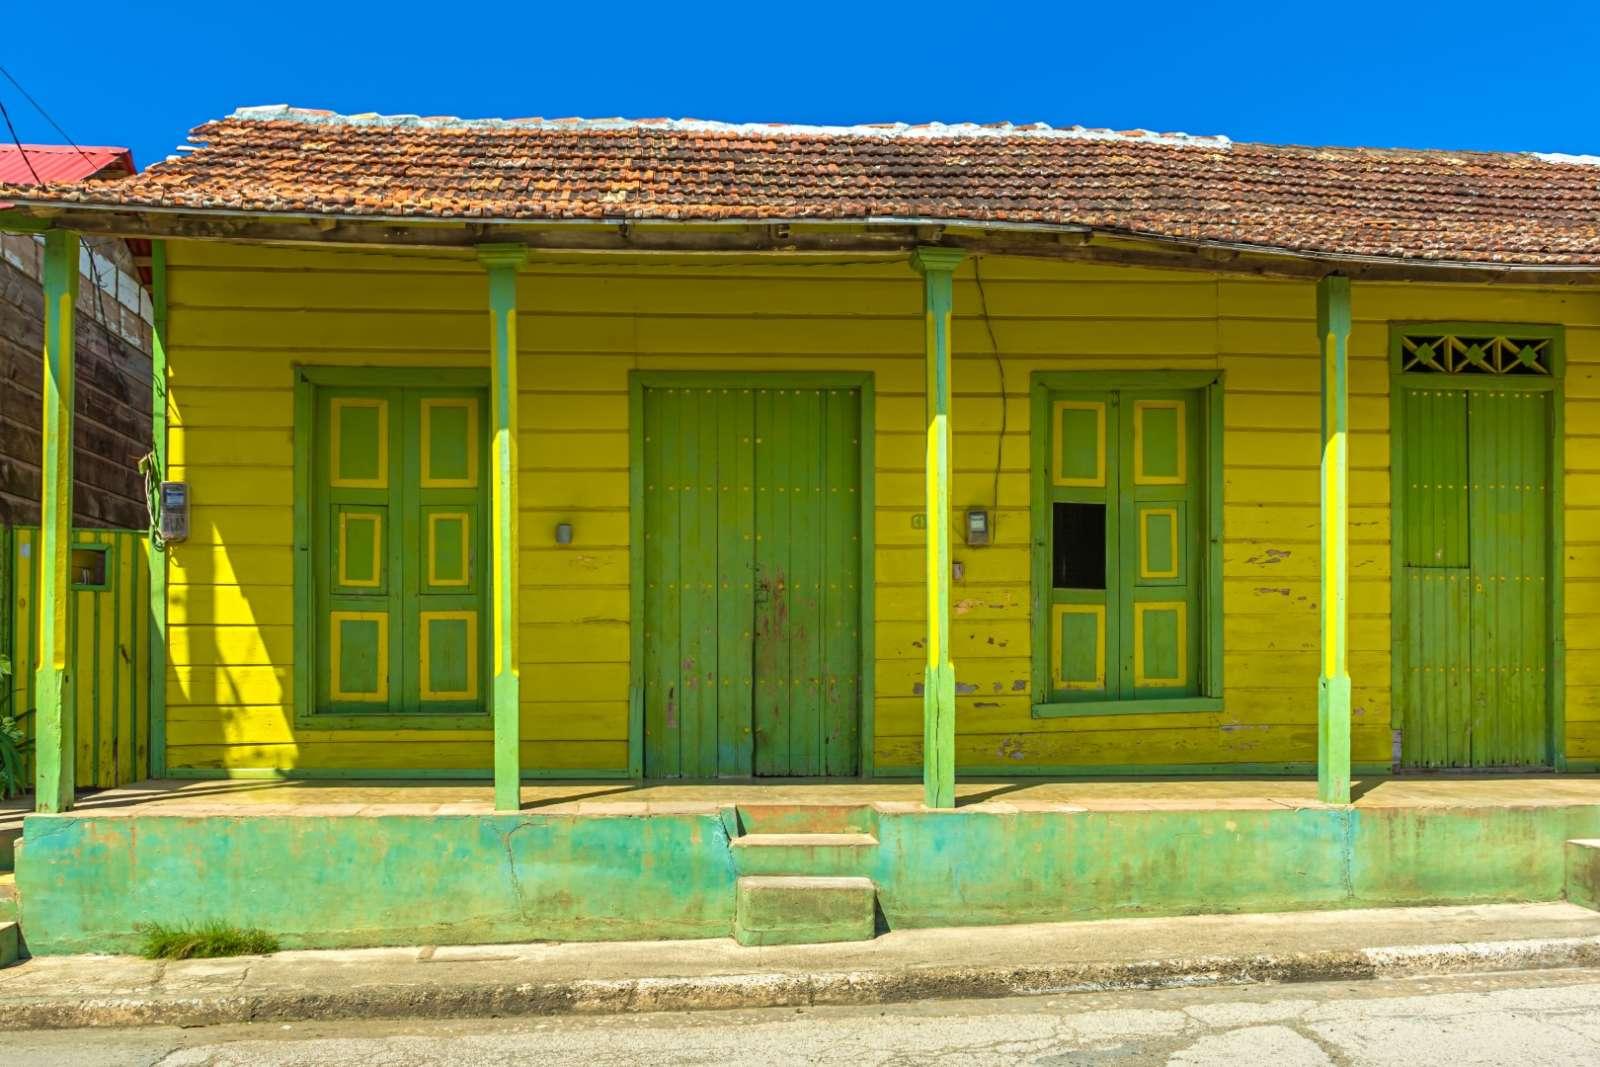 Old, yellow building in Baracoa, Cuba